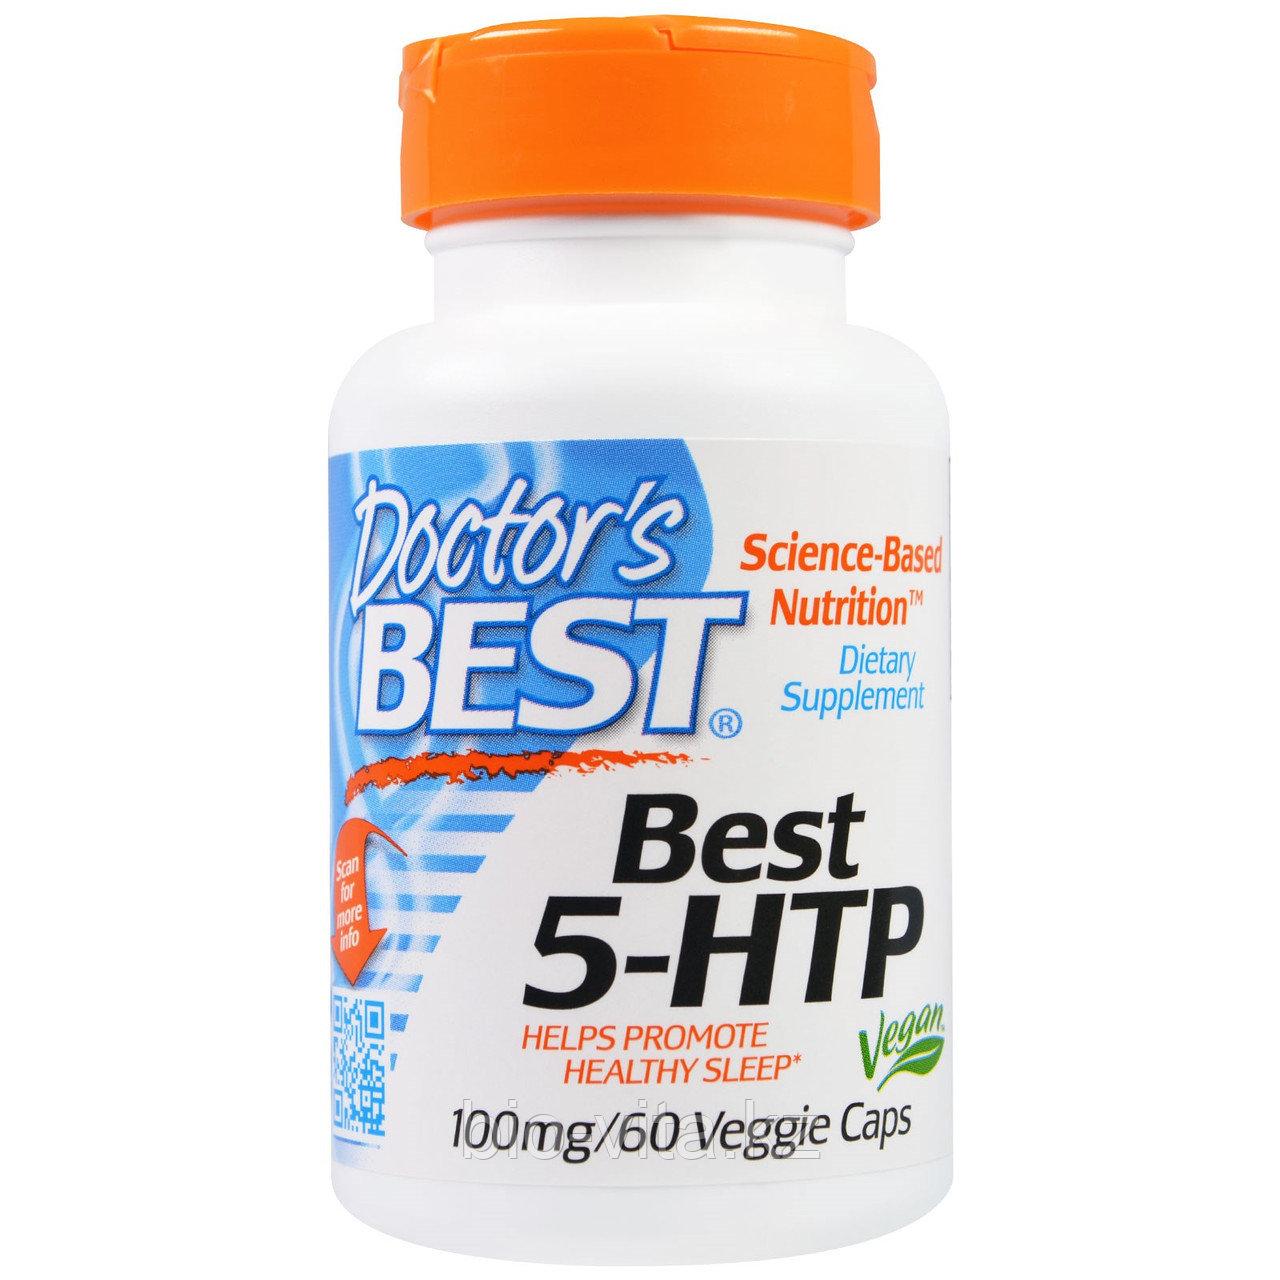 Doctor's Best, Триптофан (усиленный)5-HTP, 100 мг, 60  капсул. Натуральный.